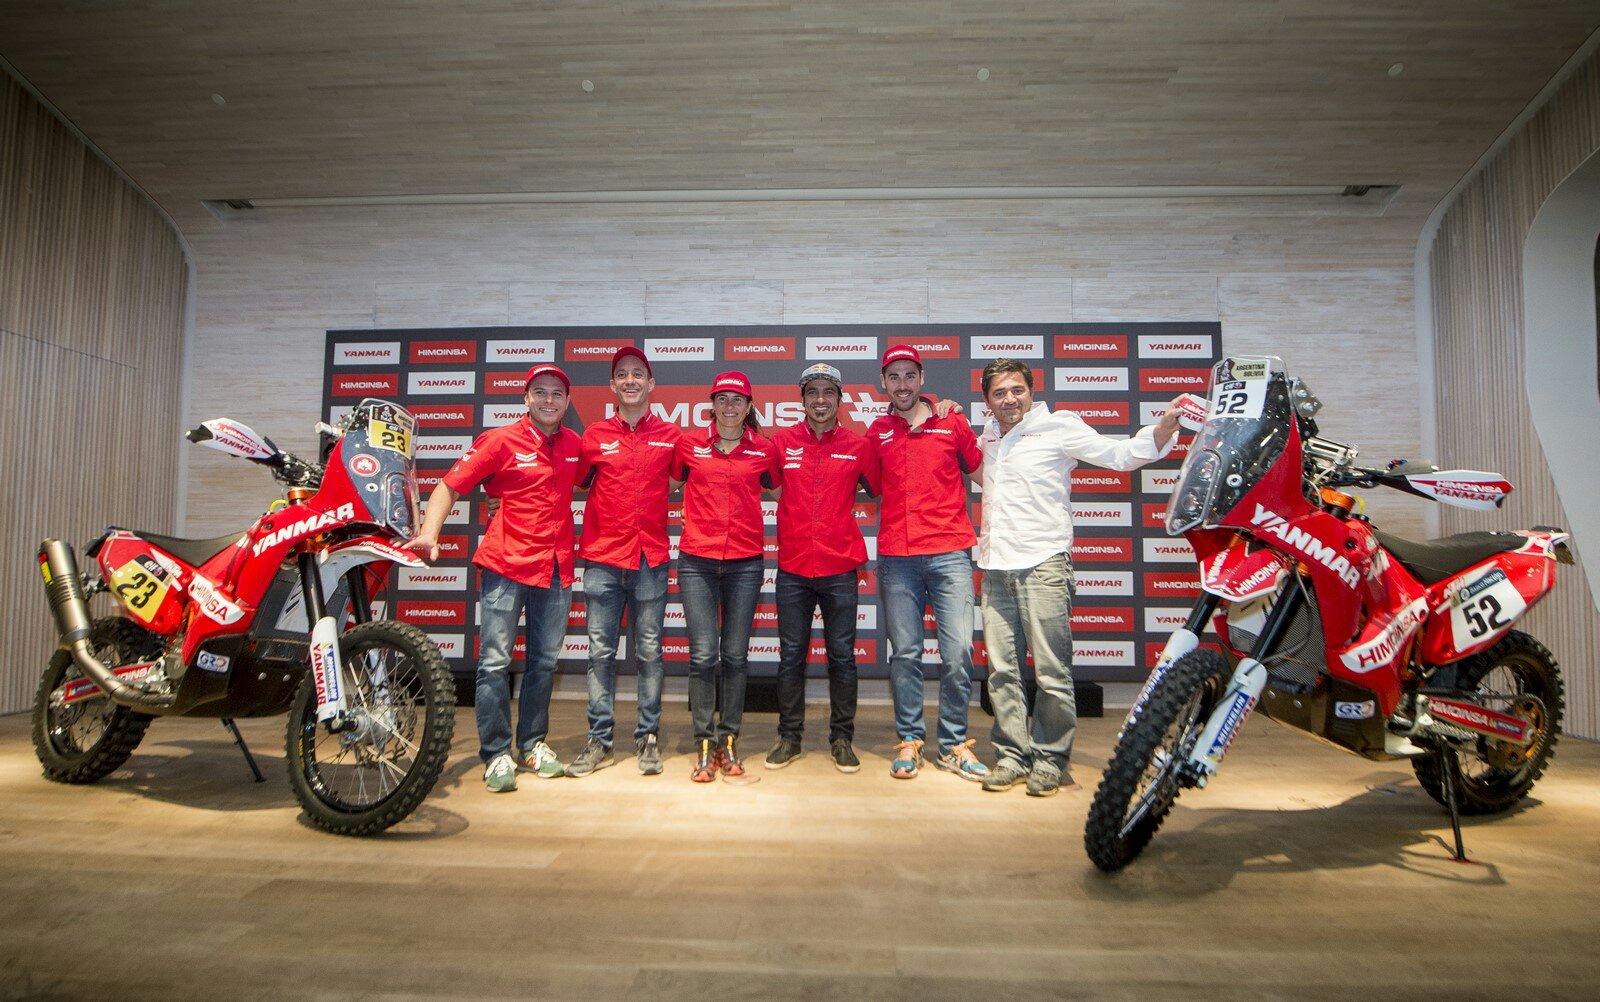 2016 Rallye Raid Dakar Argentina - Bolivia [3-16 Enero] - Página 2 CT7-d20W4AEk38i